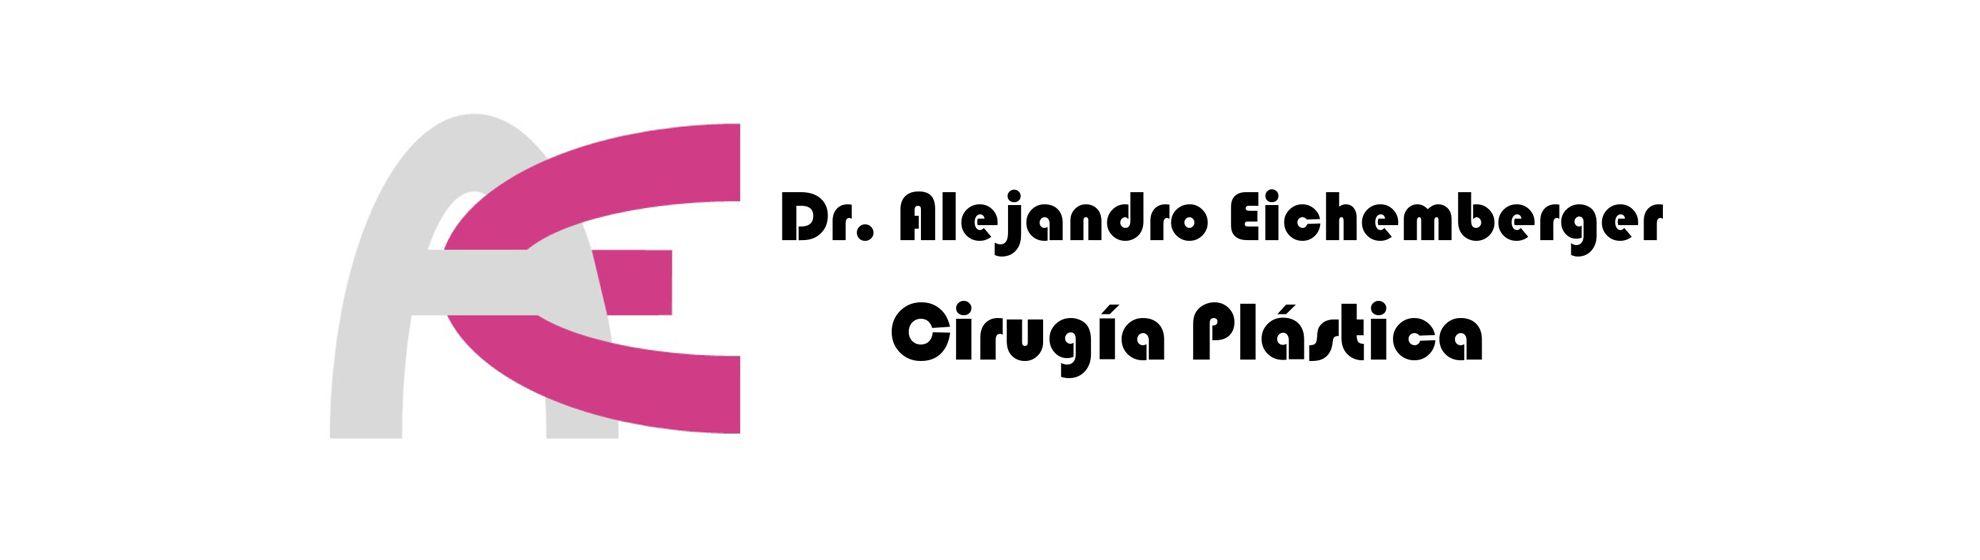 Dr. Alejandro Eichemberger